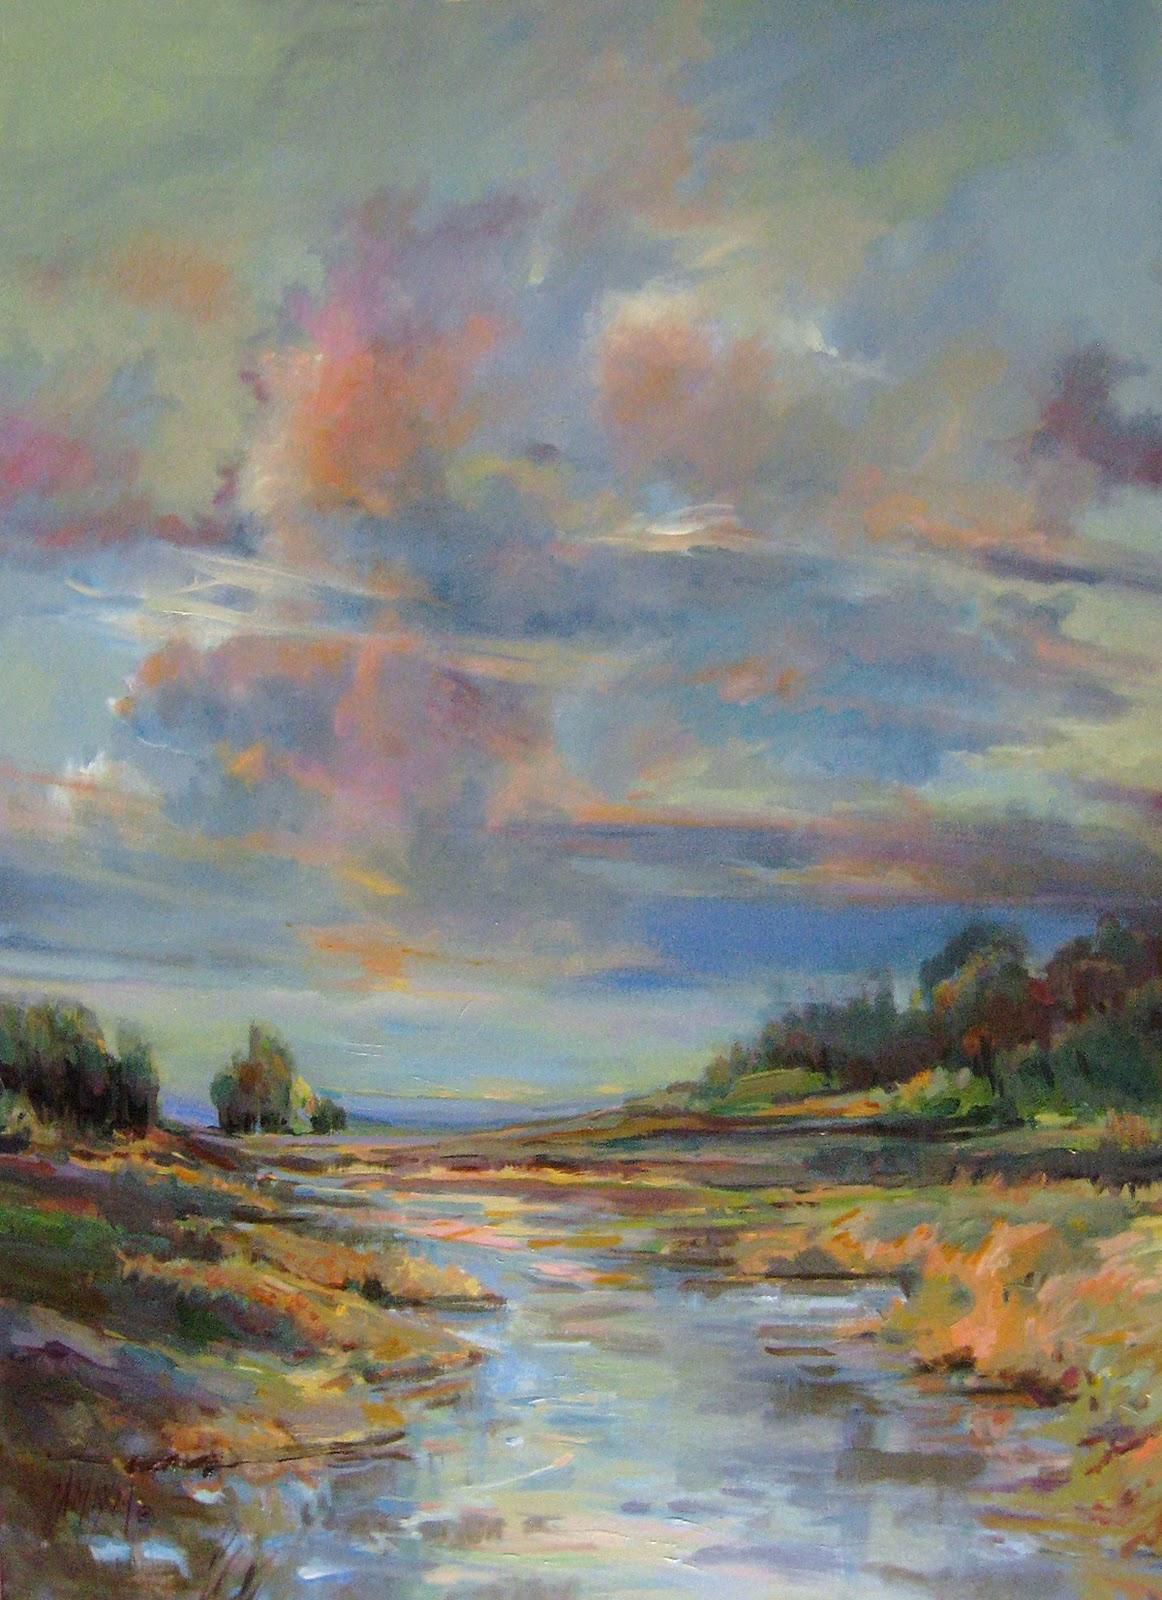 Mary Maxam - paintings: September 2010